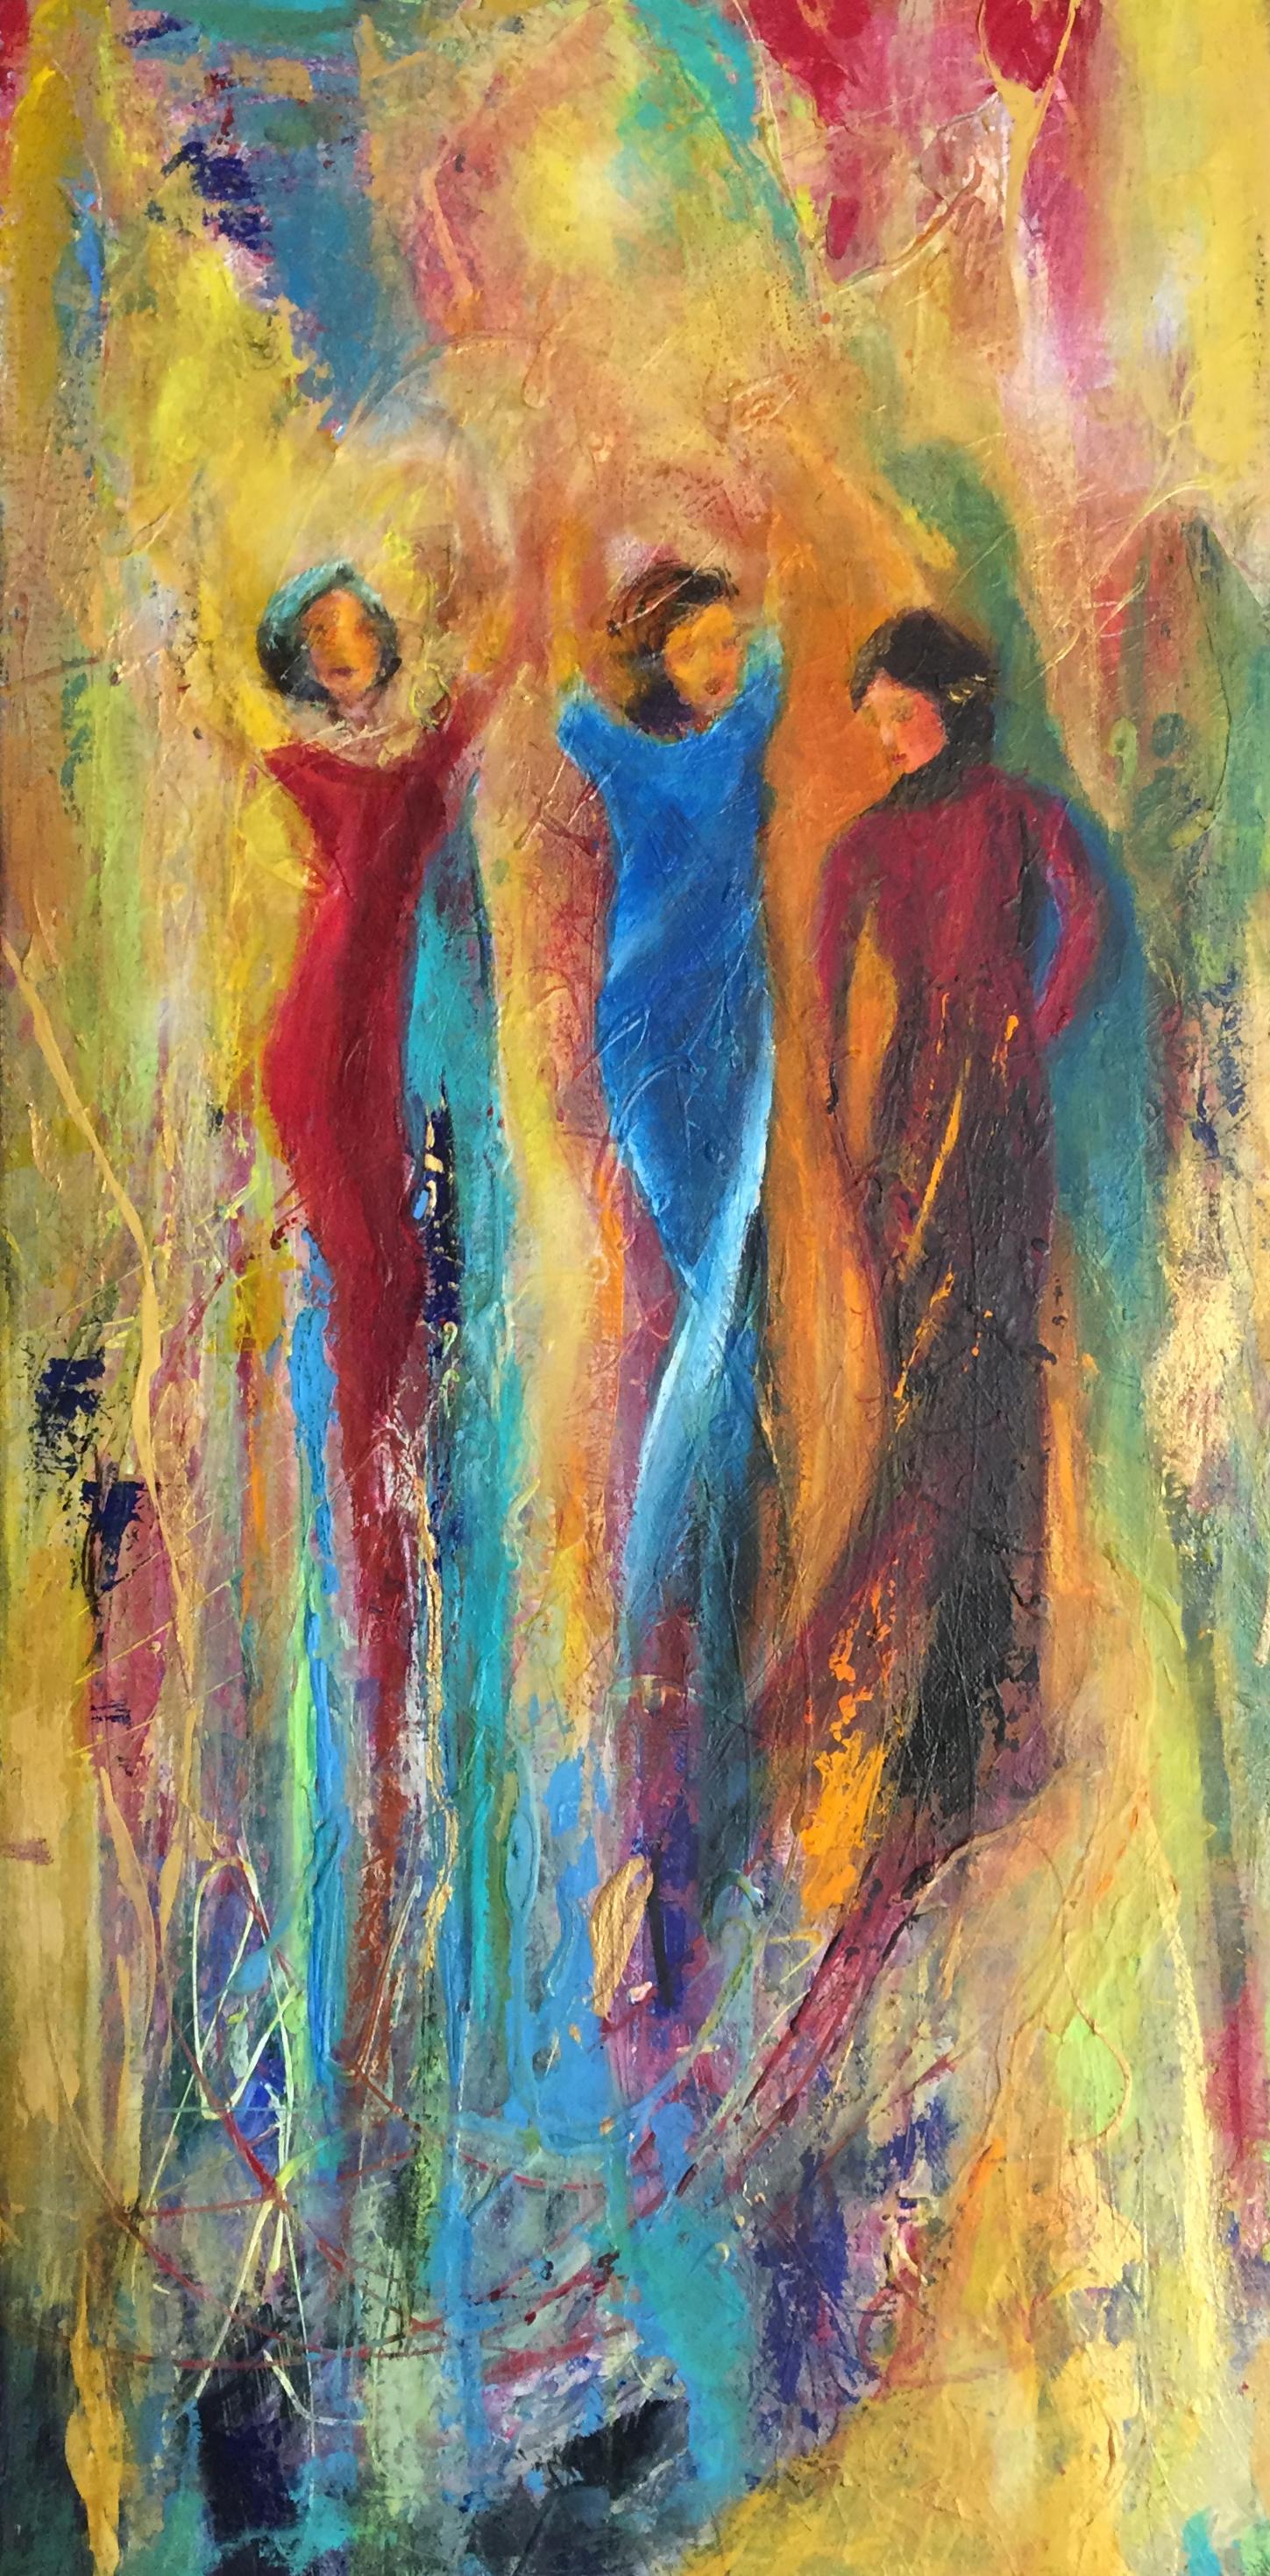 Joyous by Artist Aruna Chagarlamudi (Aruna's Art Studio)